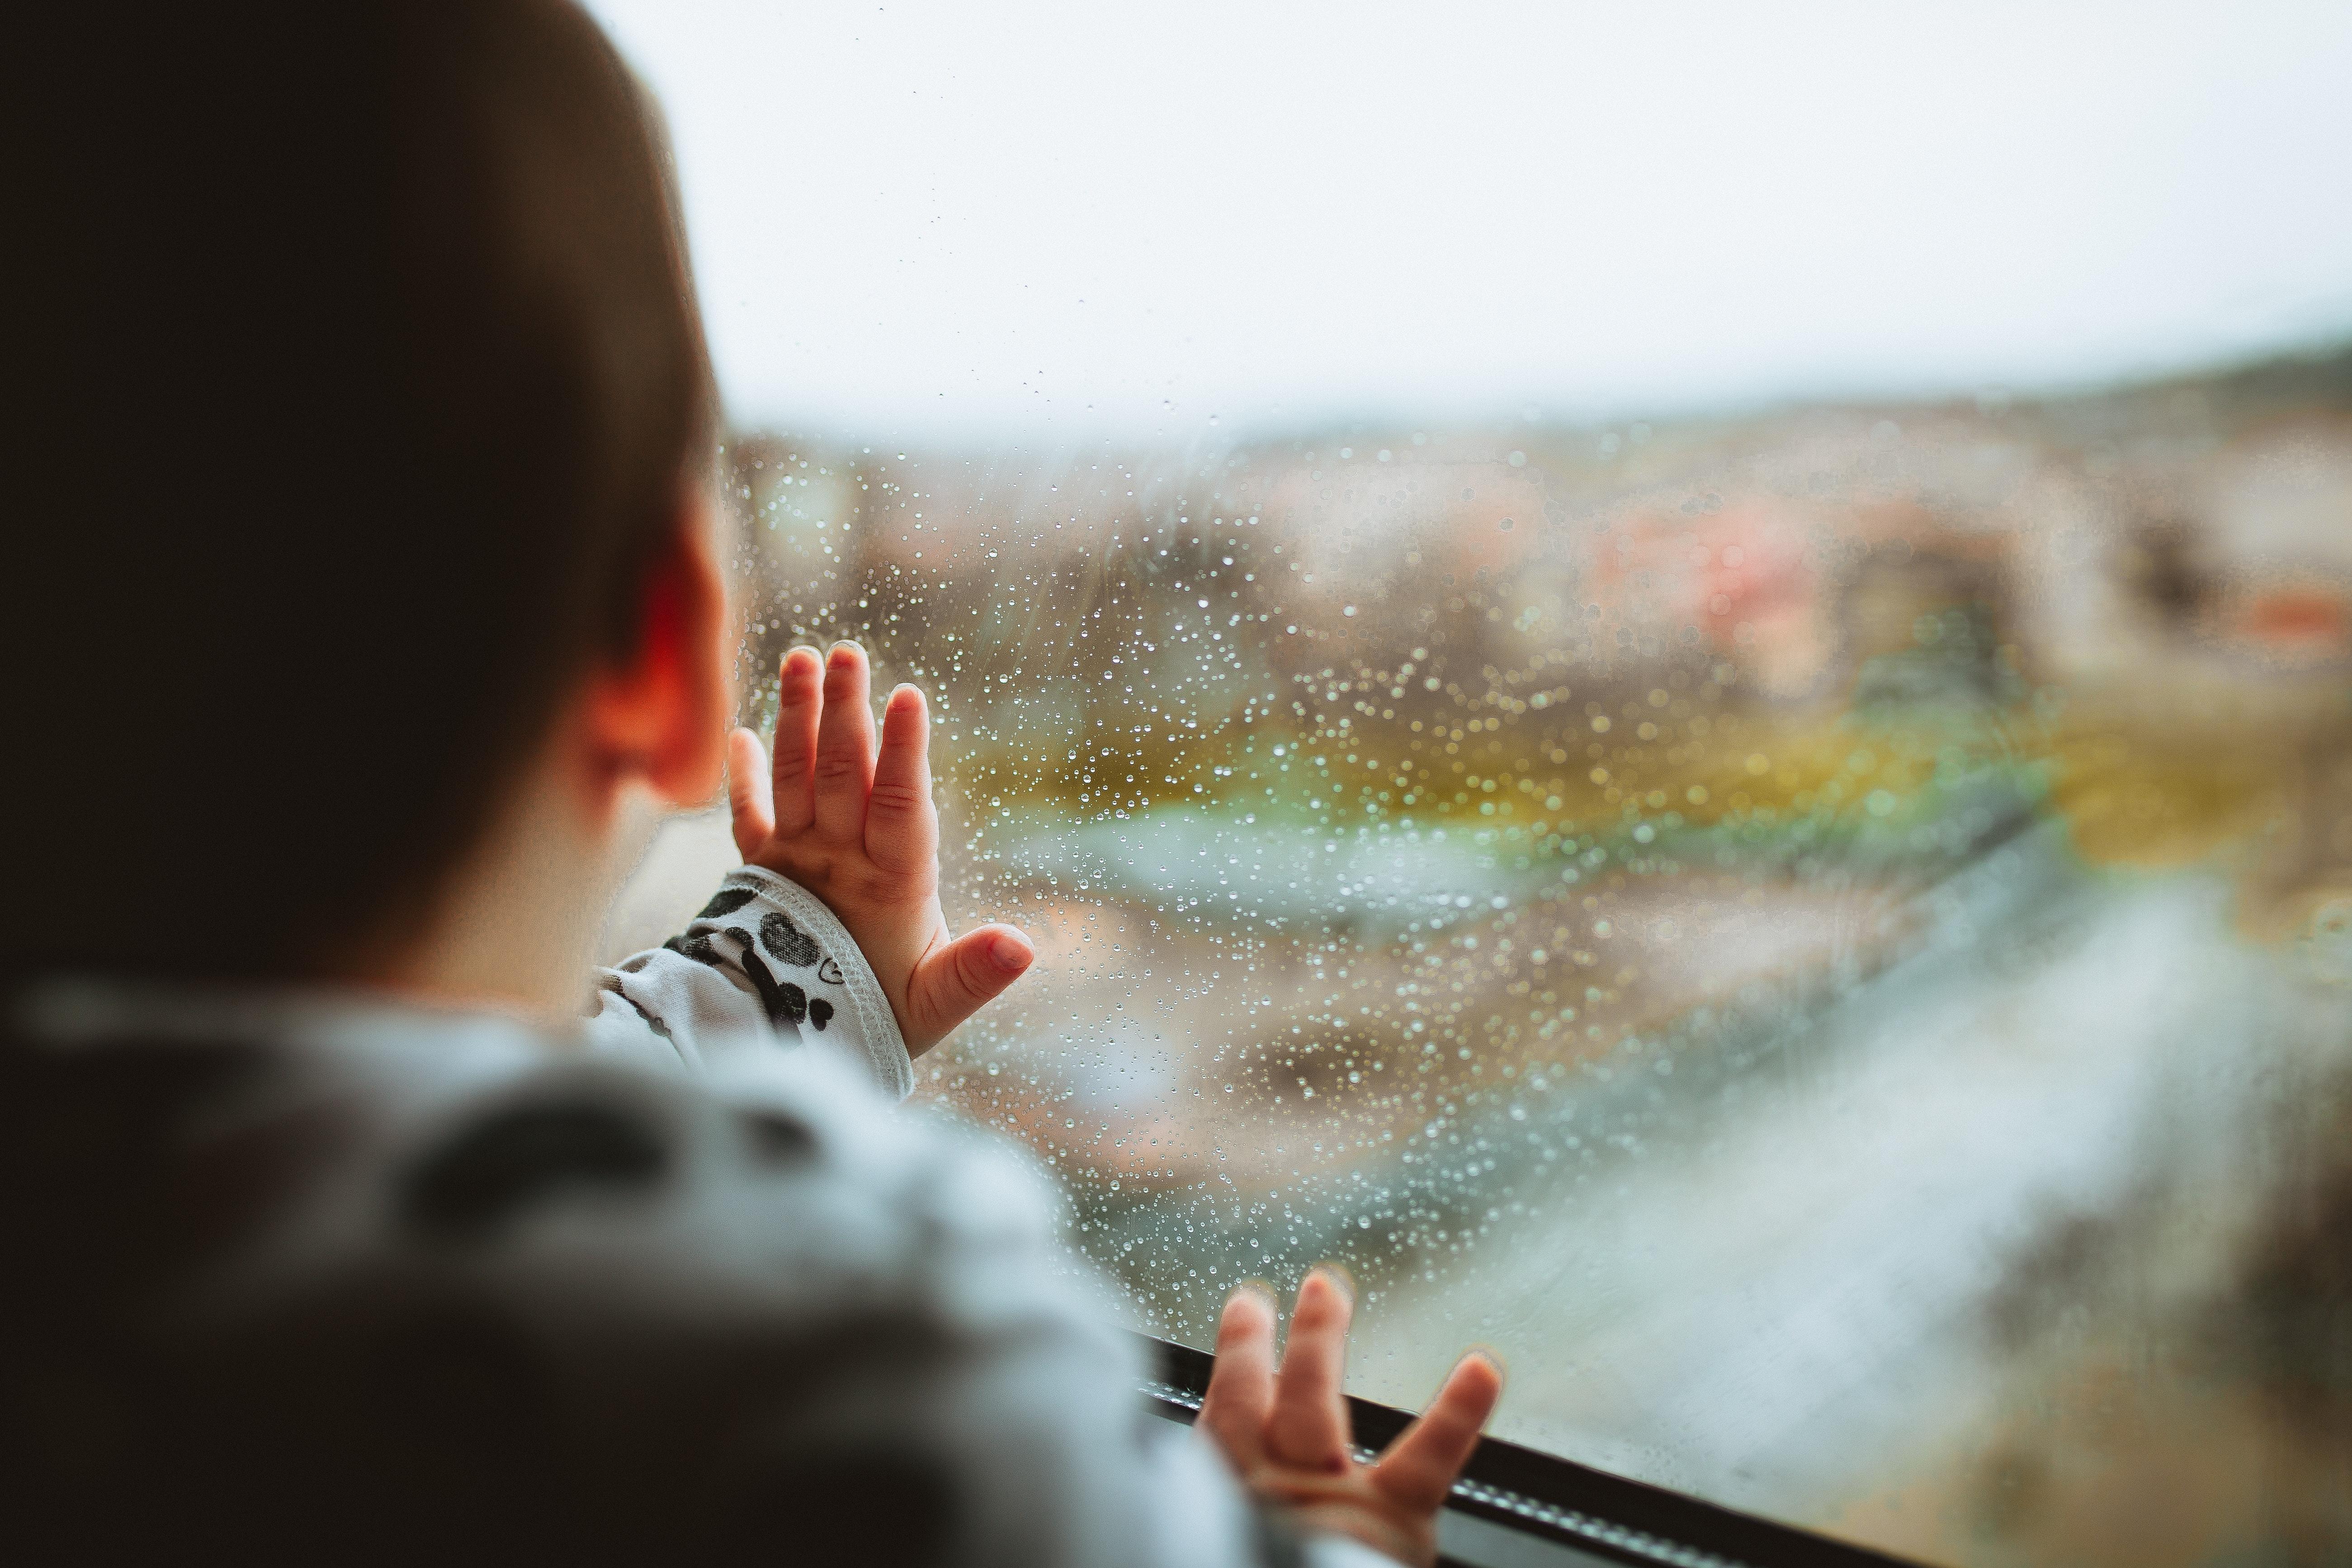 Child viewing city skyline